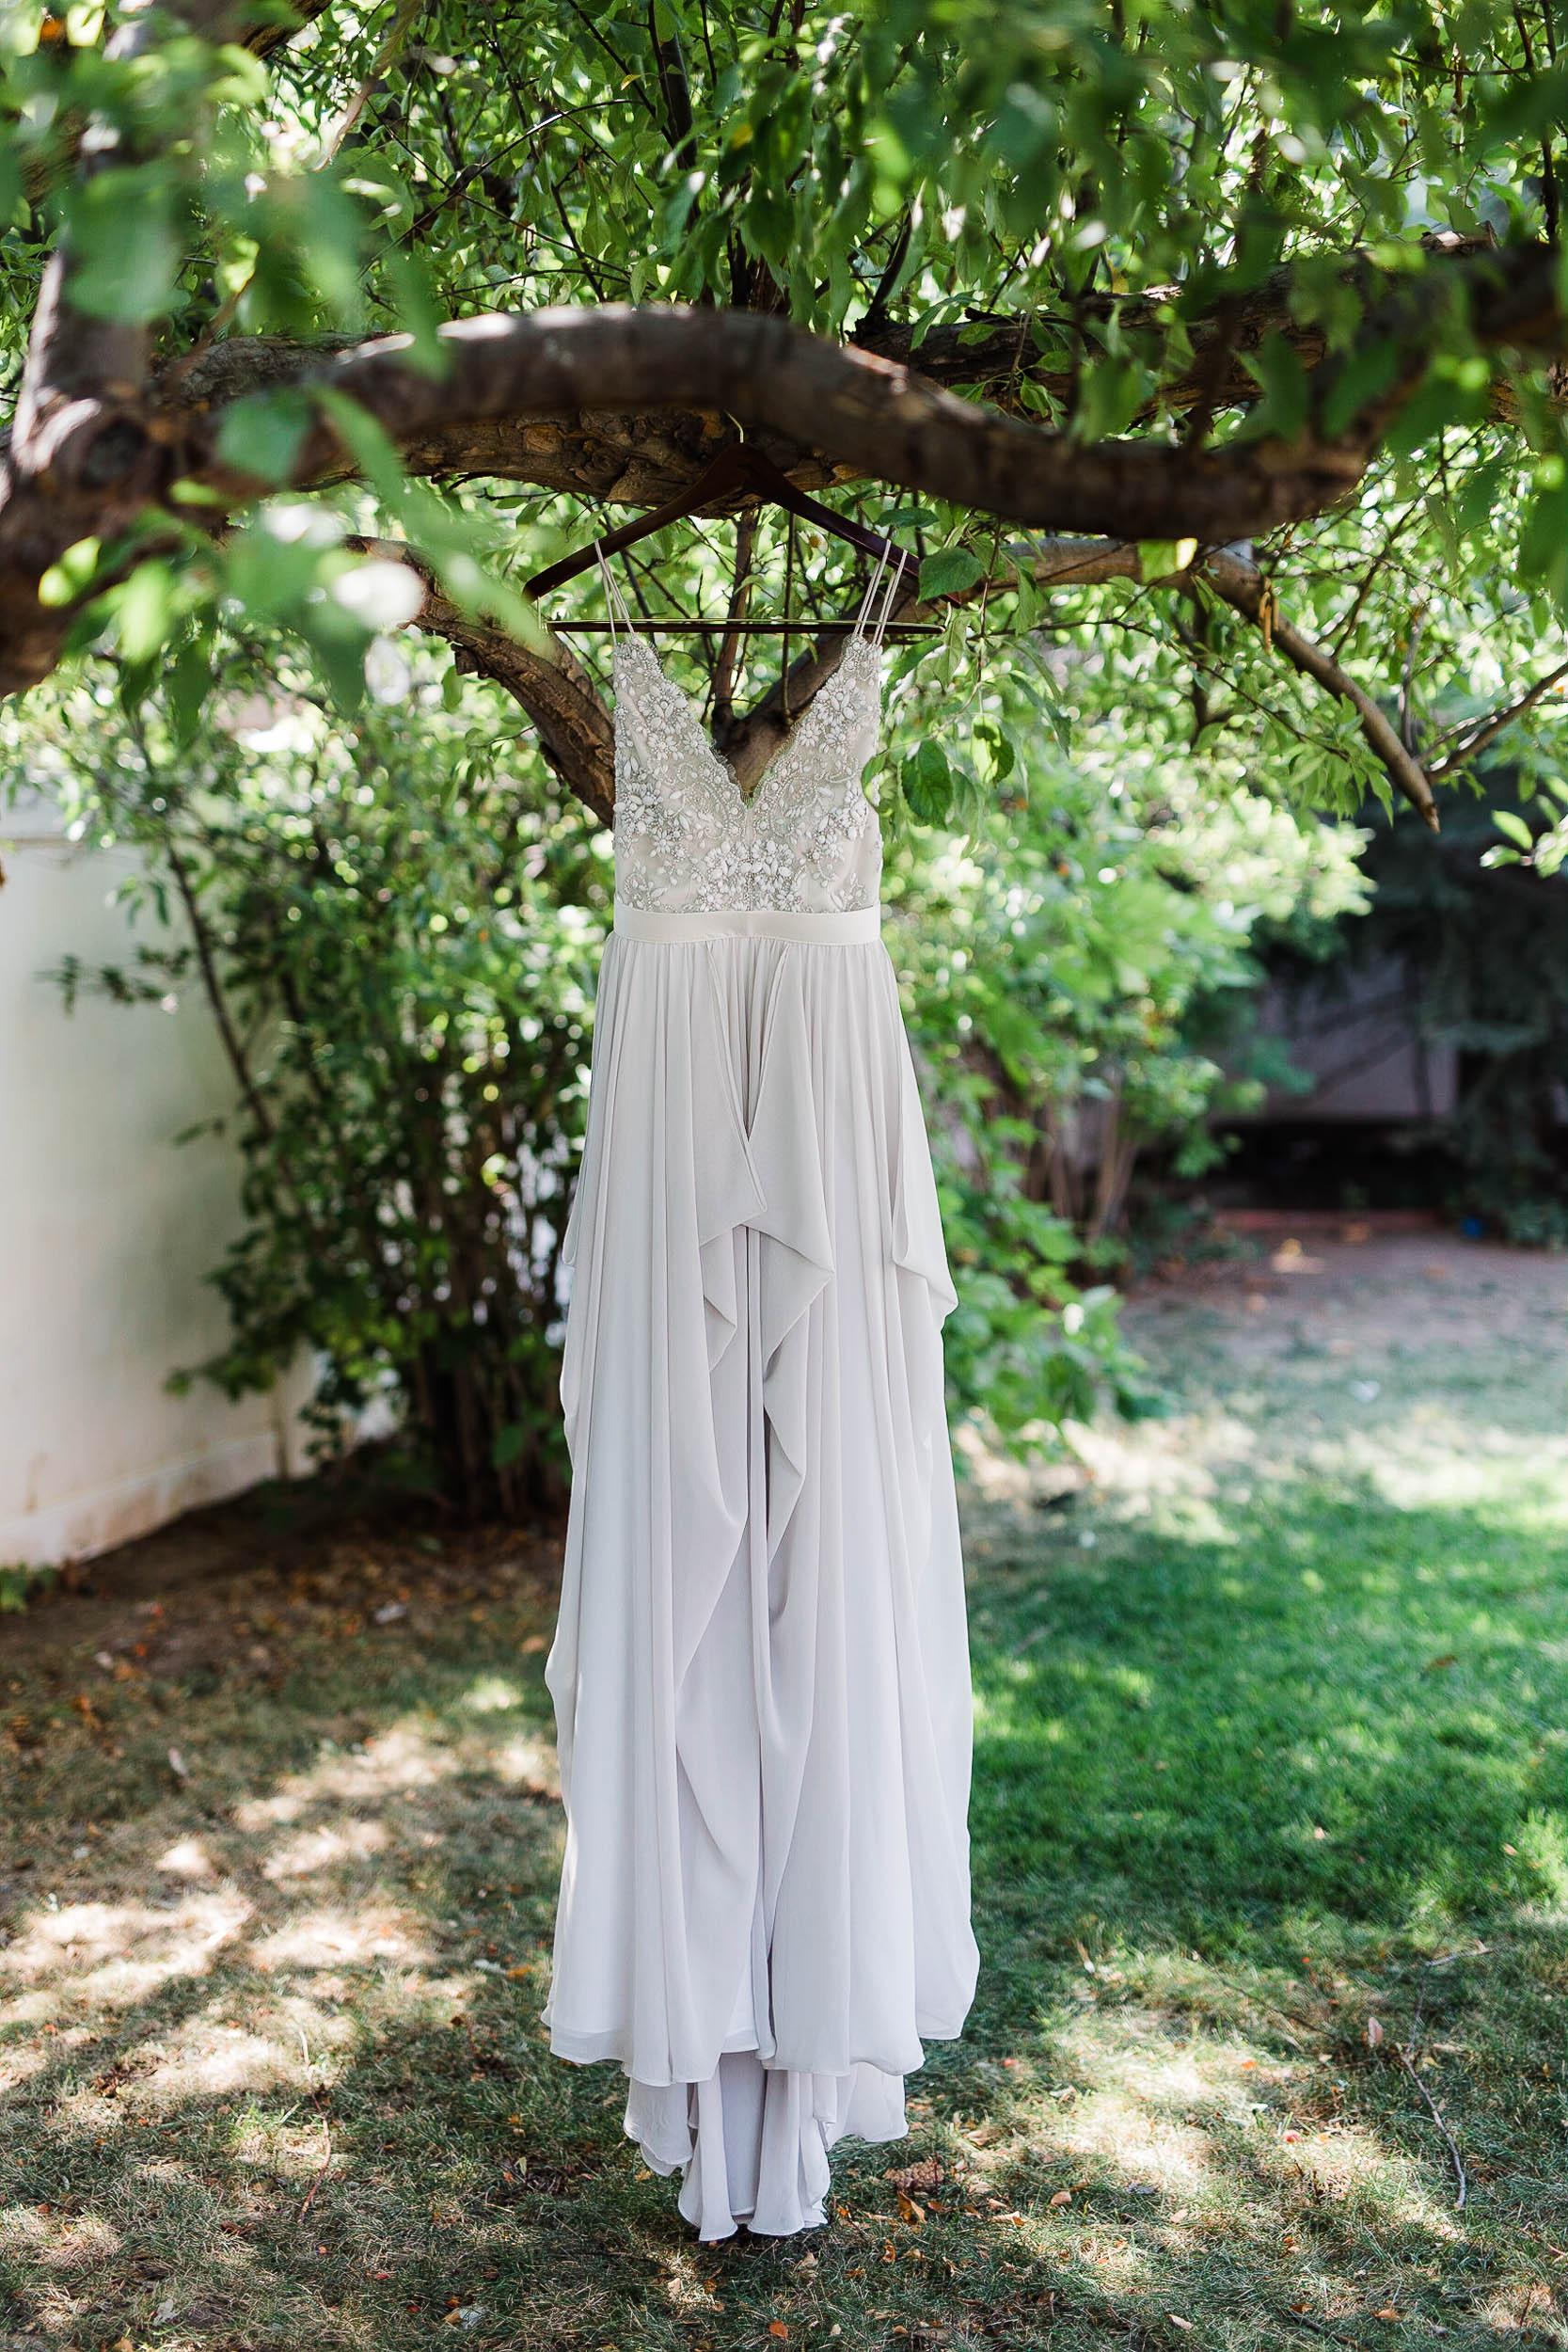 Tru Velle bridal dress from A and Be Denver Bridal Shop